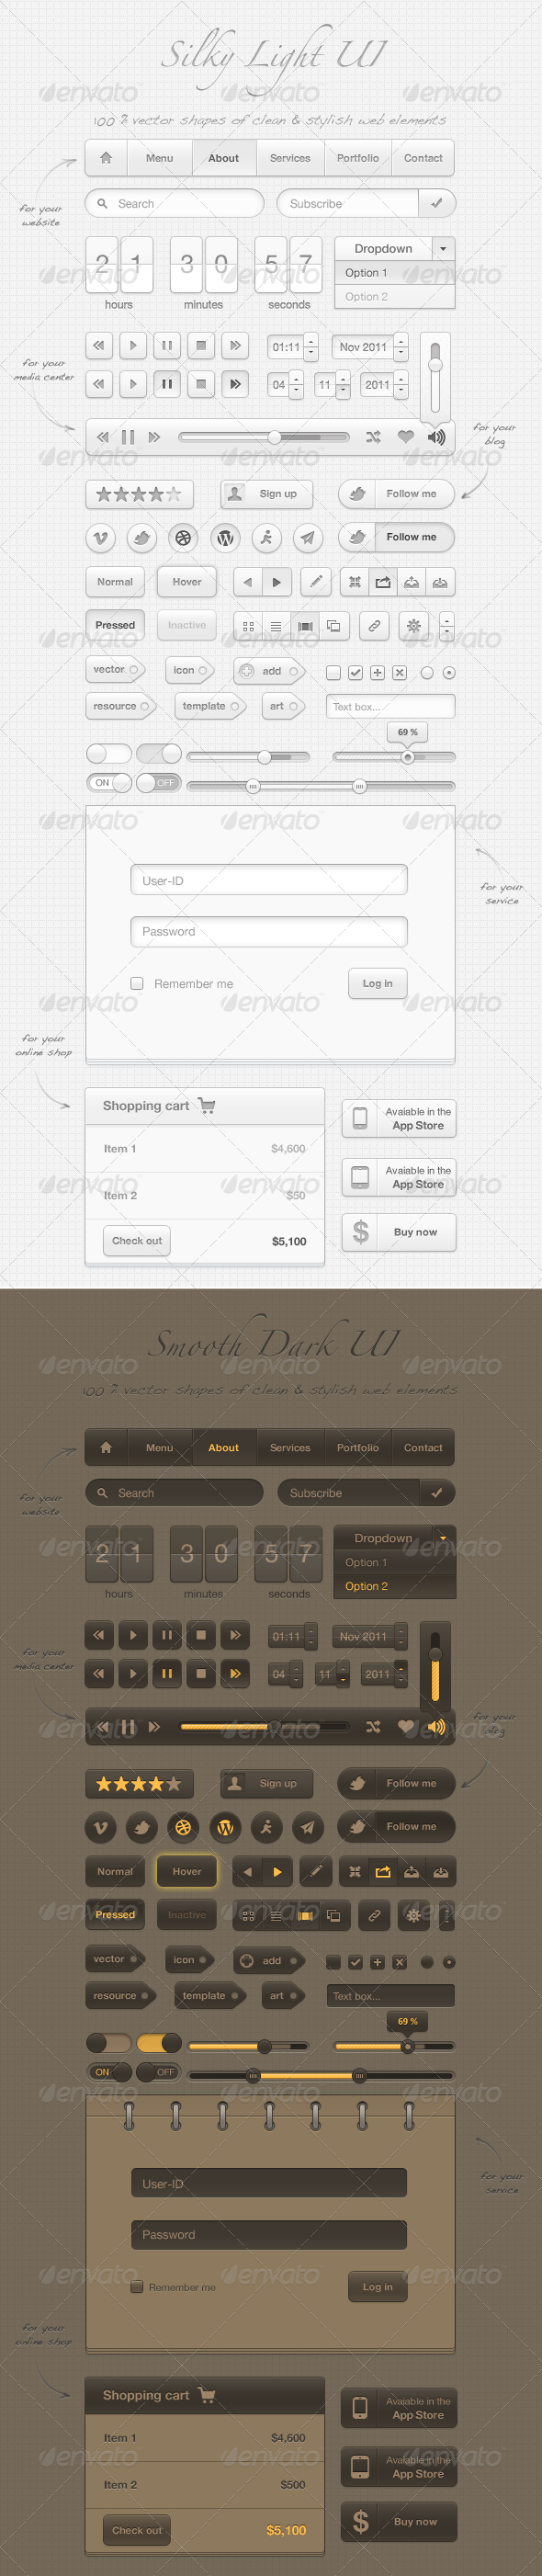 GraphicRiver Silky User Interface 100% vector arts 861173